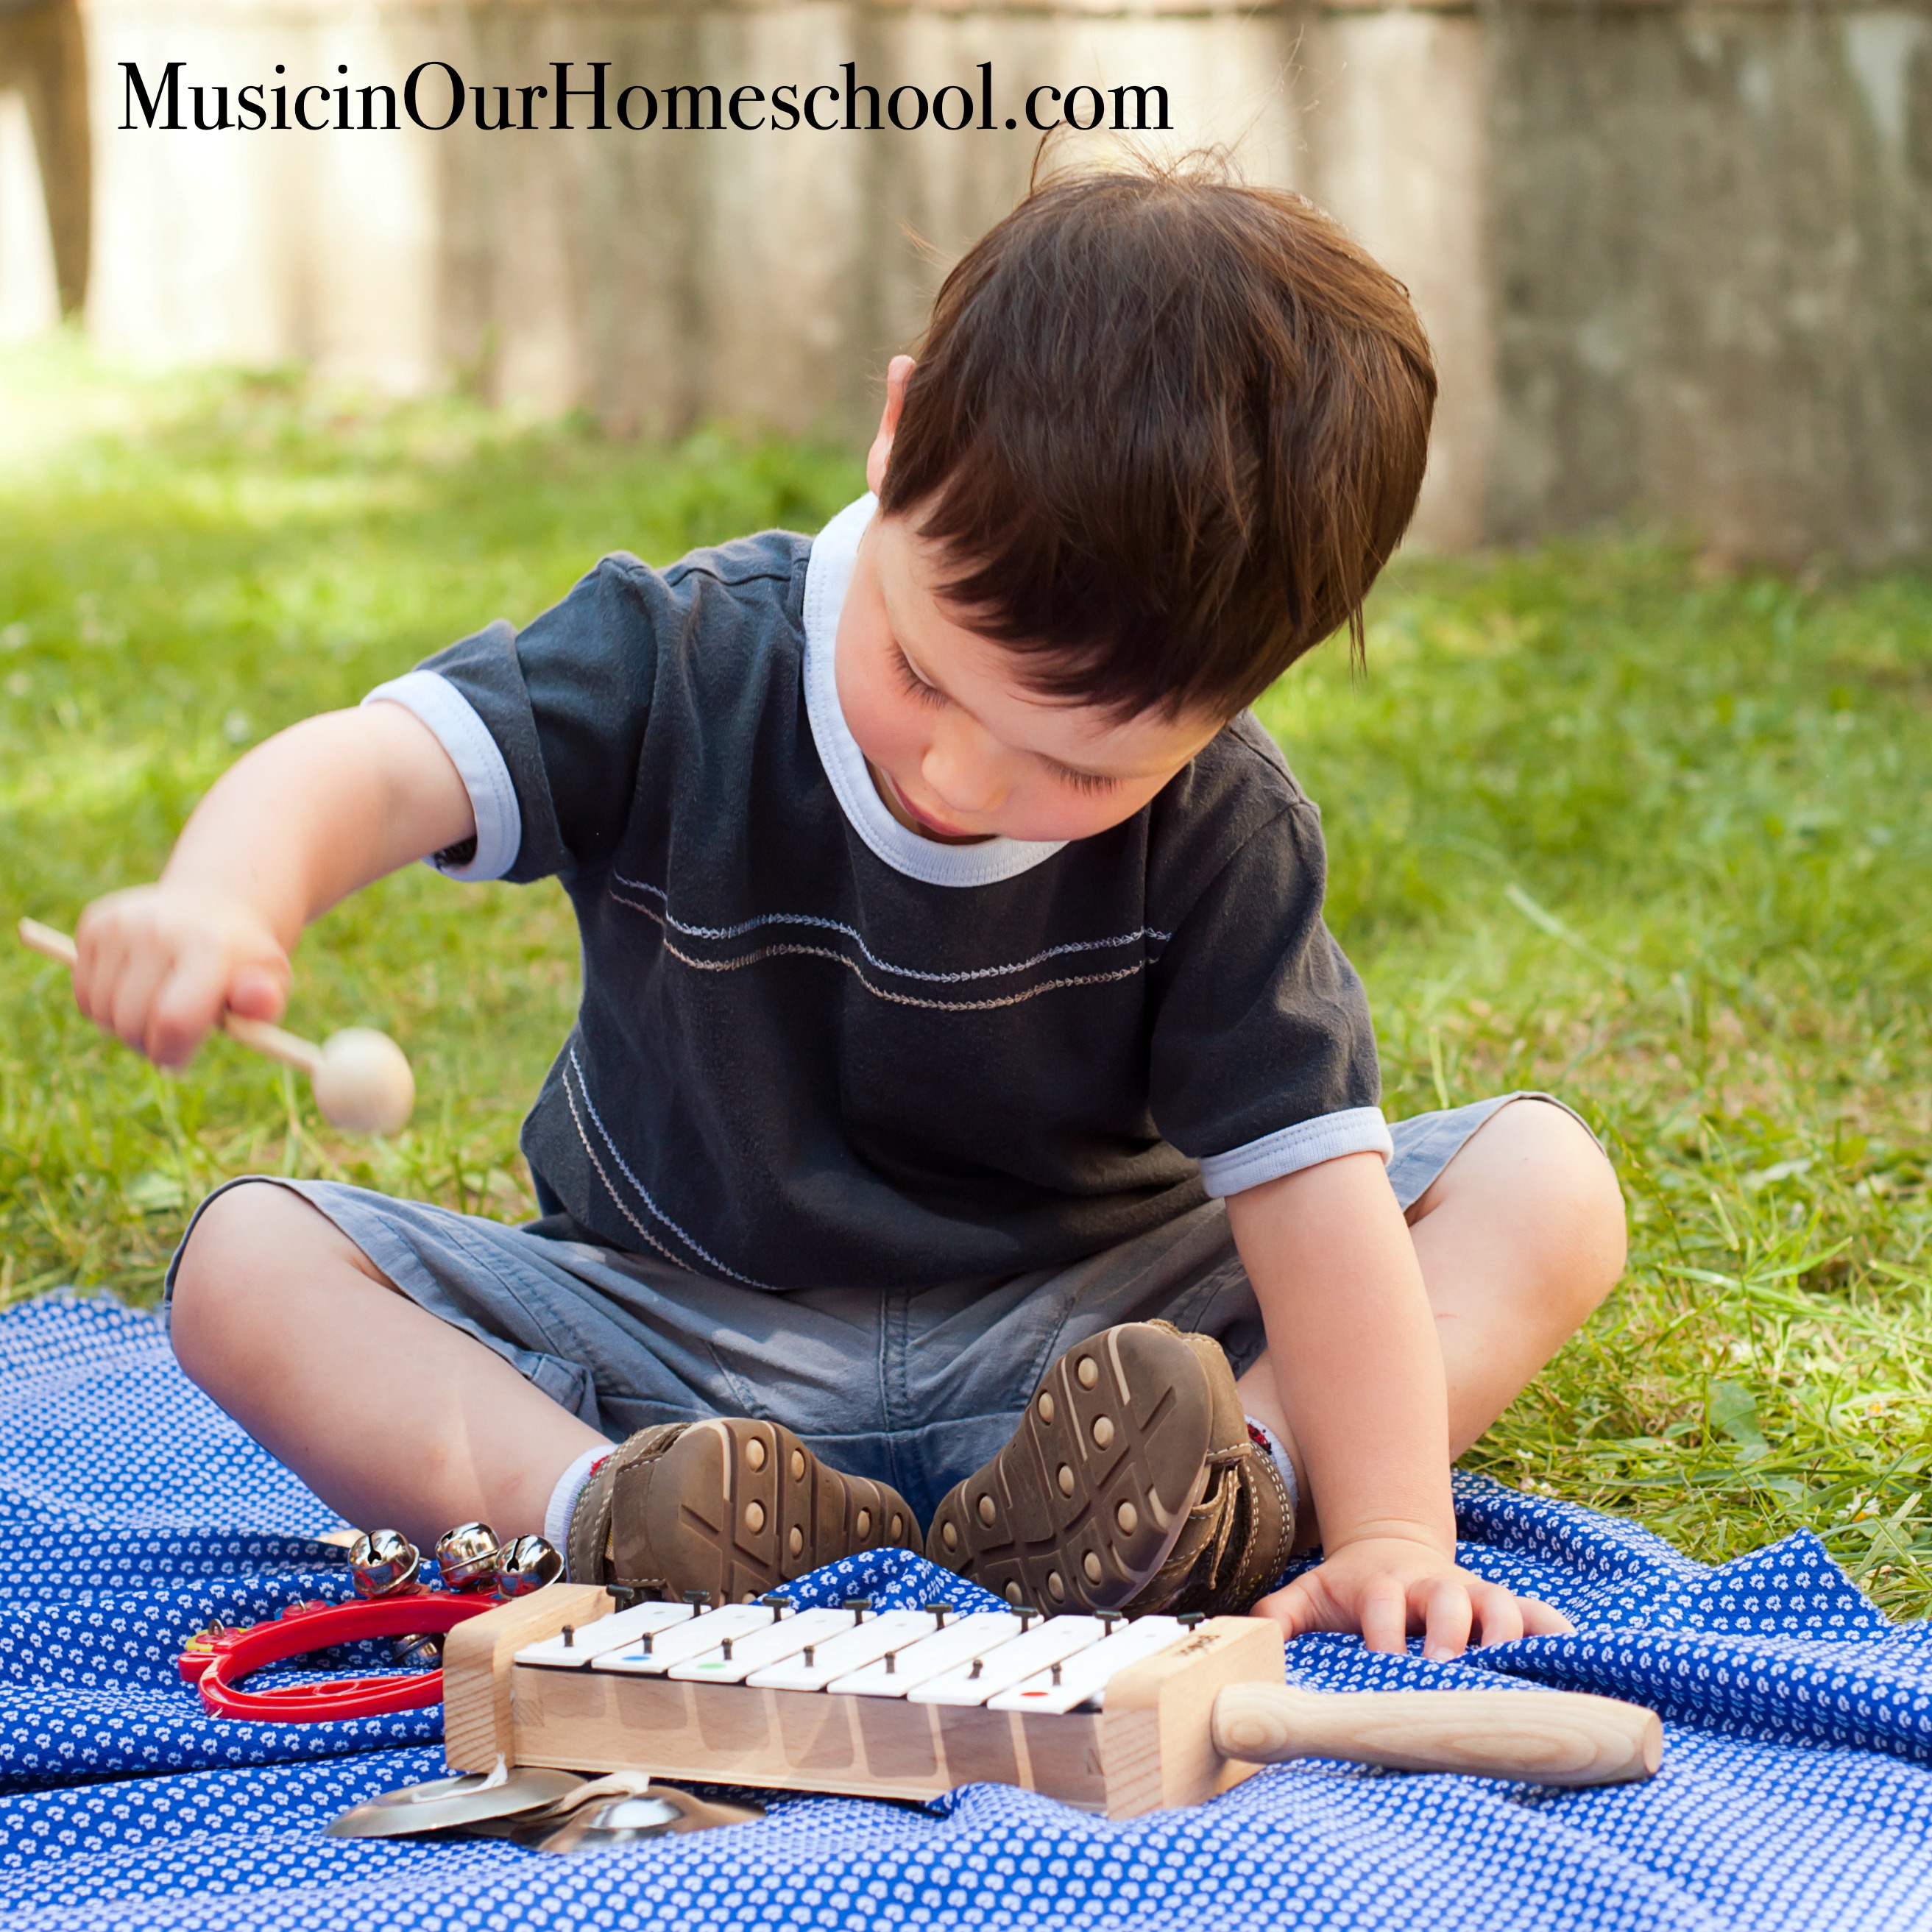 How to Teach Music the Charlotte Mason Way #charlottemason #musicinourhomeschool #homeschoolmusic